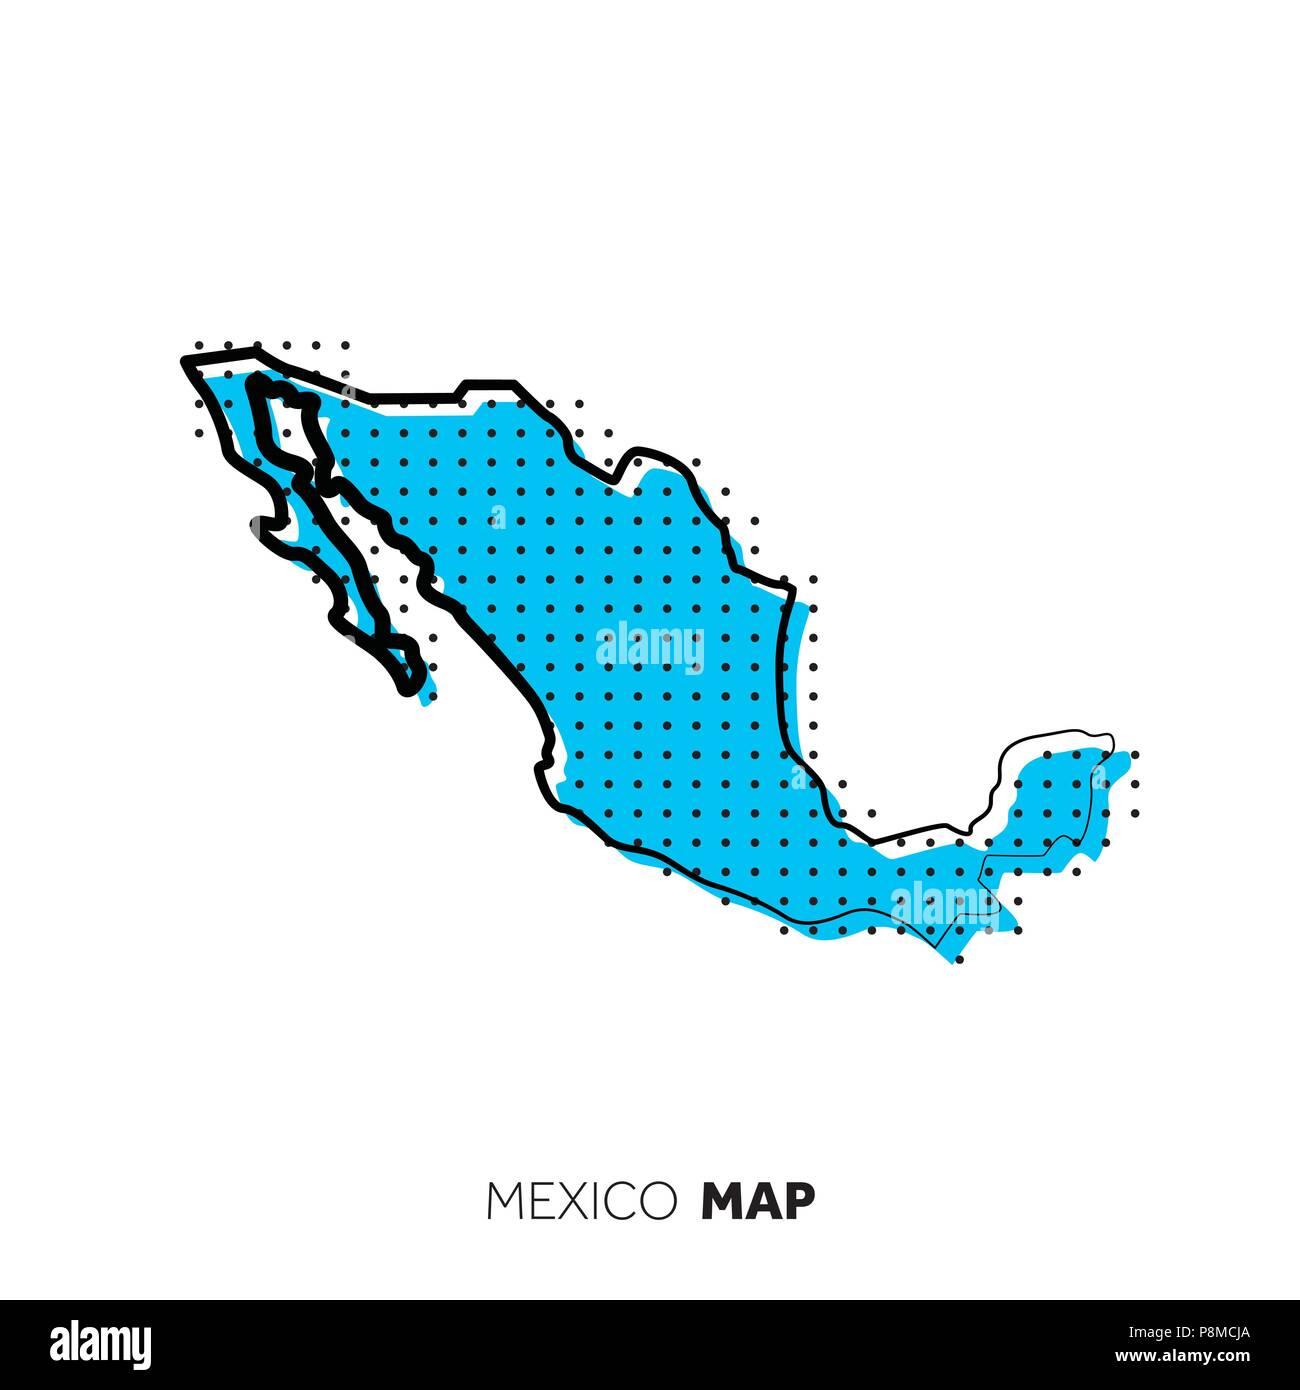 Mexiko Karte Umriss.Mexiko Vektor Land Karte Karte Umriss Mit Punkten Vektor